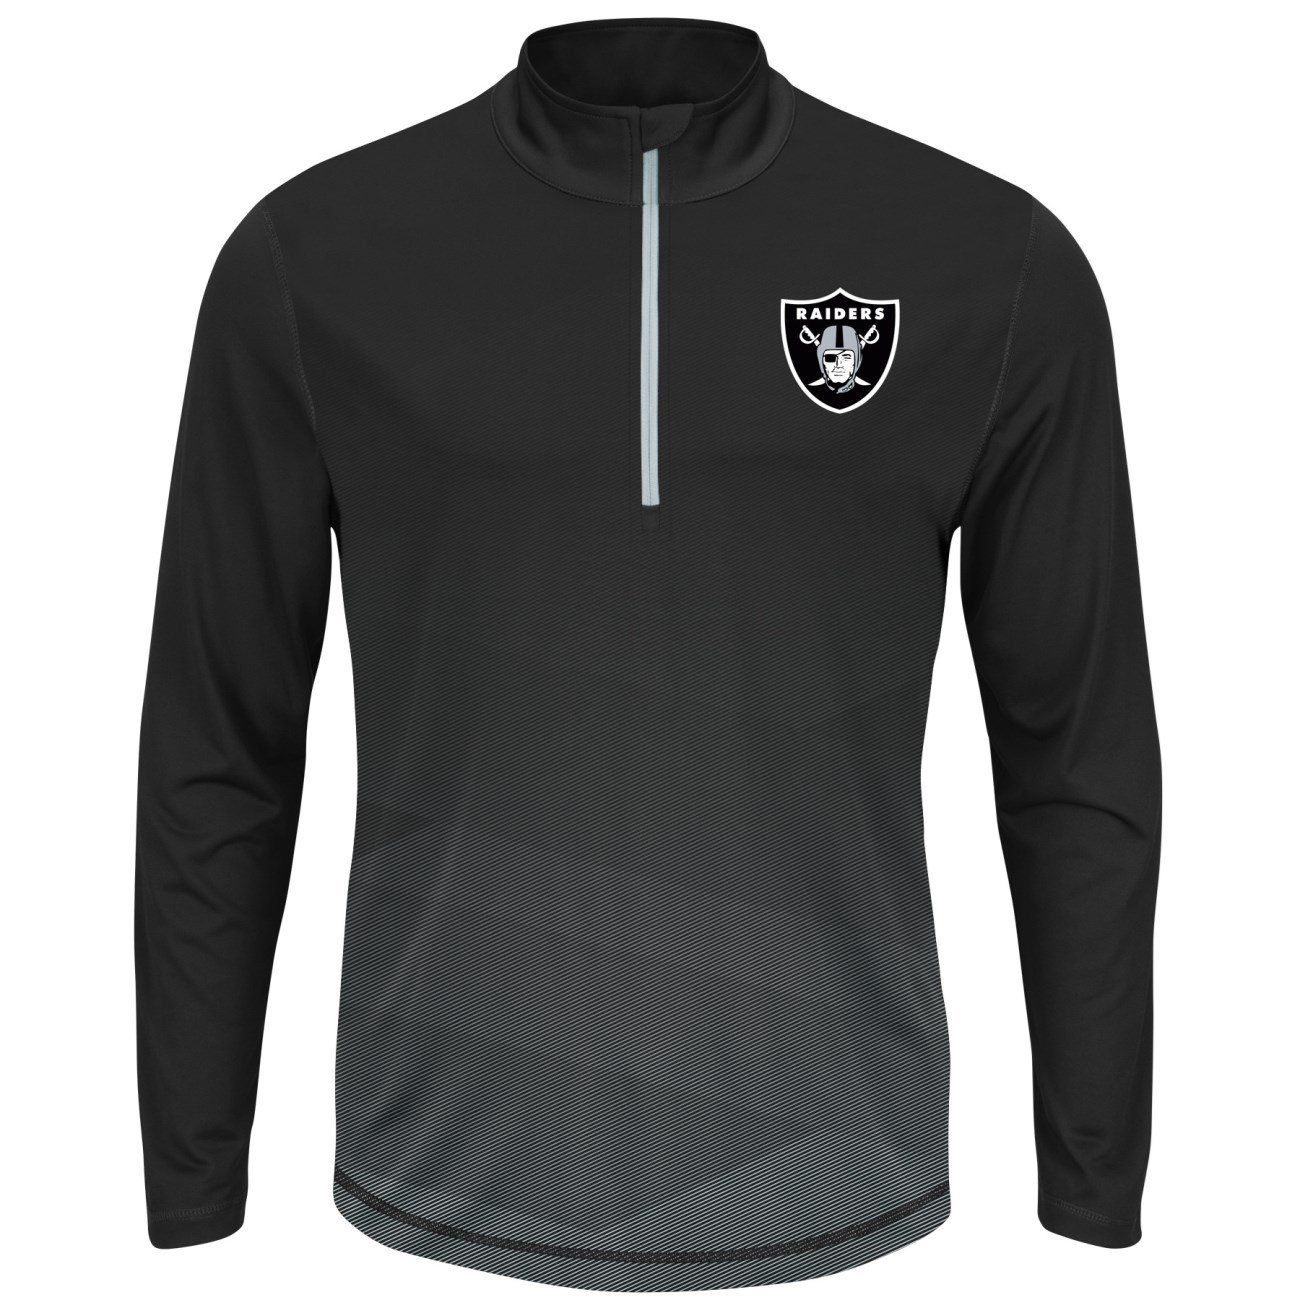 Oakland Raiders Majestic NFL Intimidating